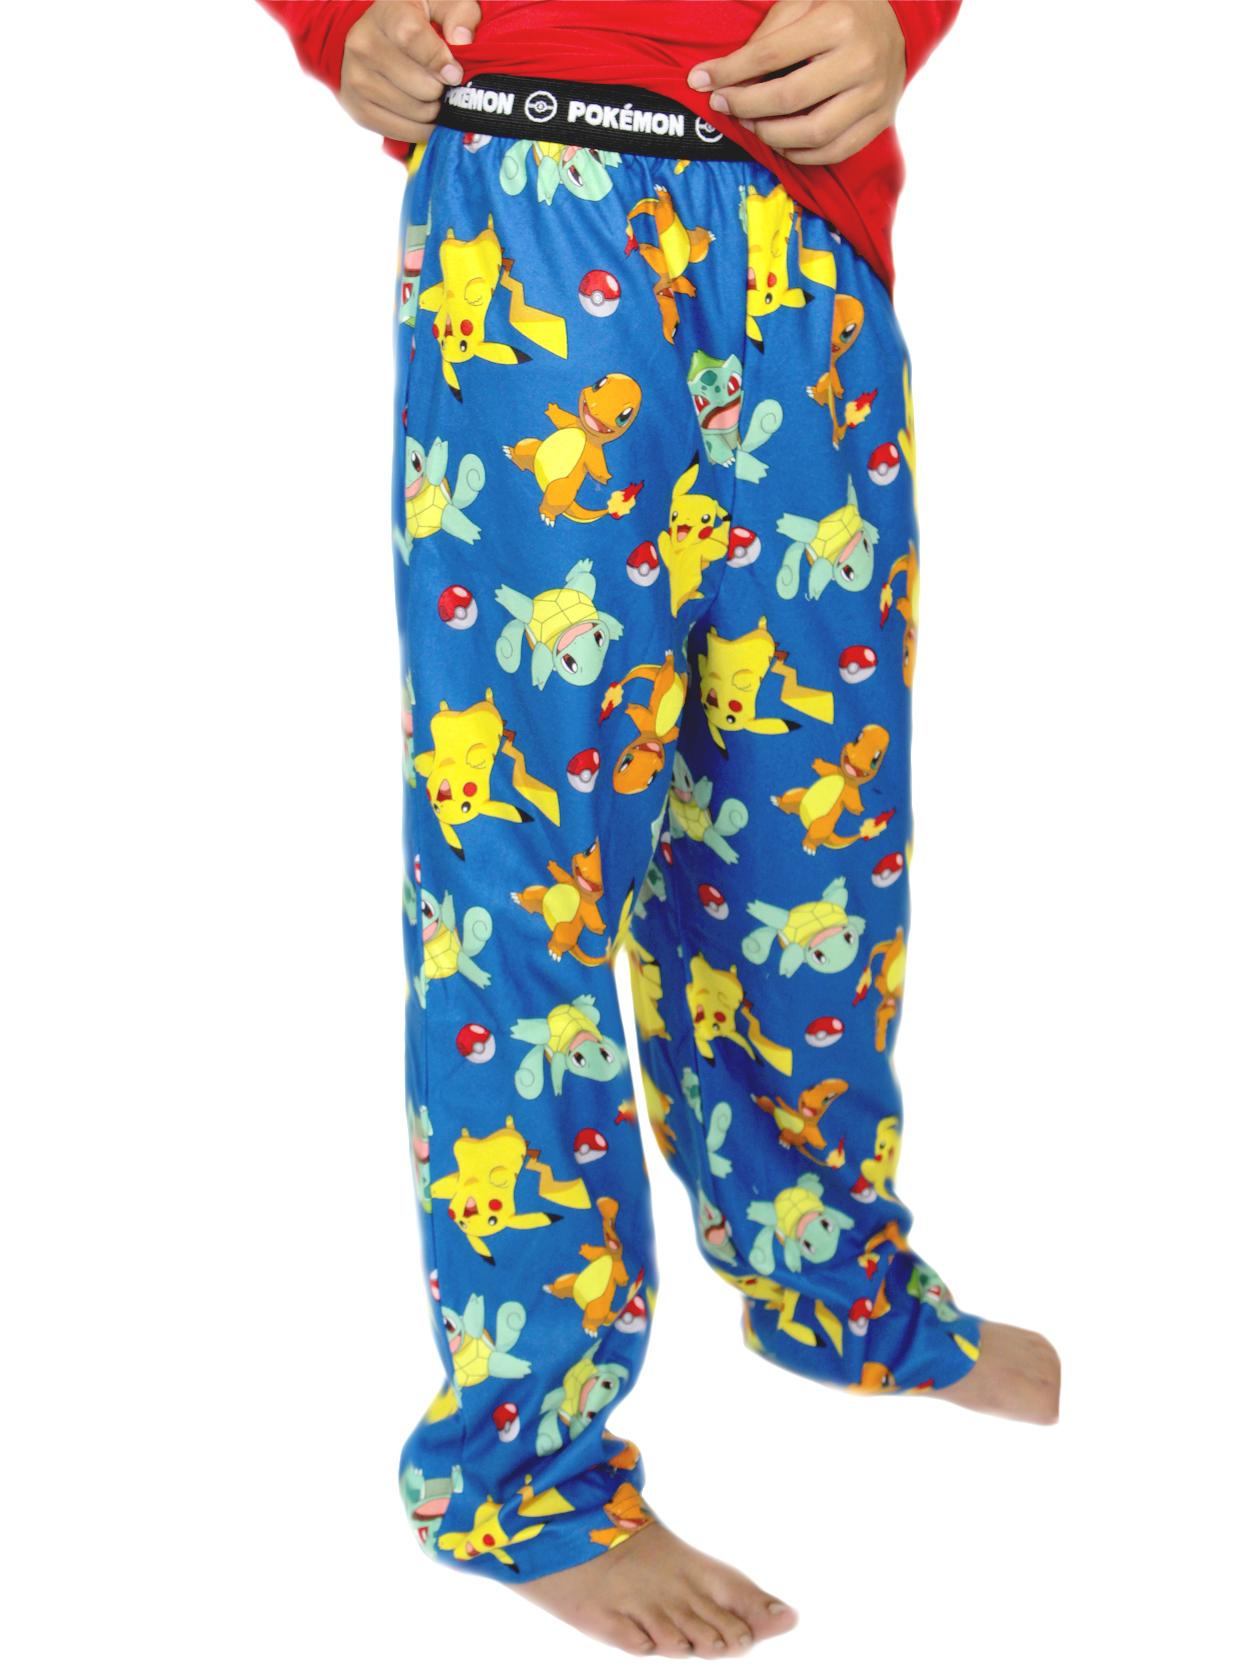 Pokemon Boy's Flannel Pajama Pants (Little Kid/Big Kid) 21PK144BPT